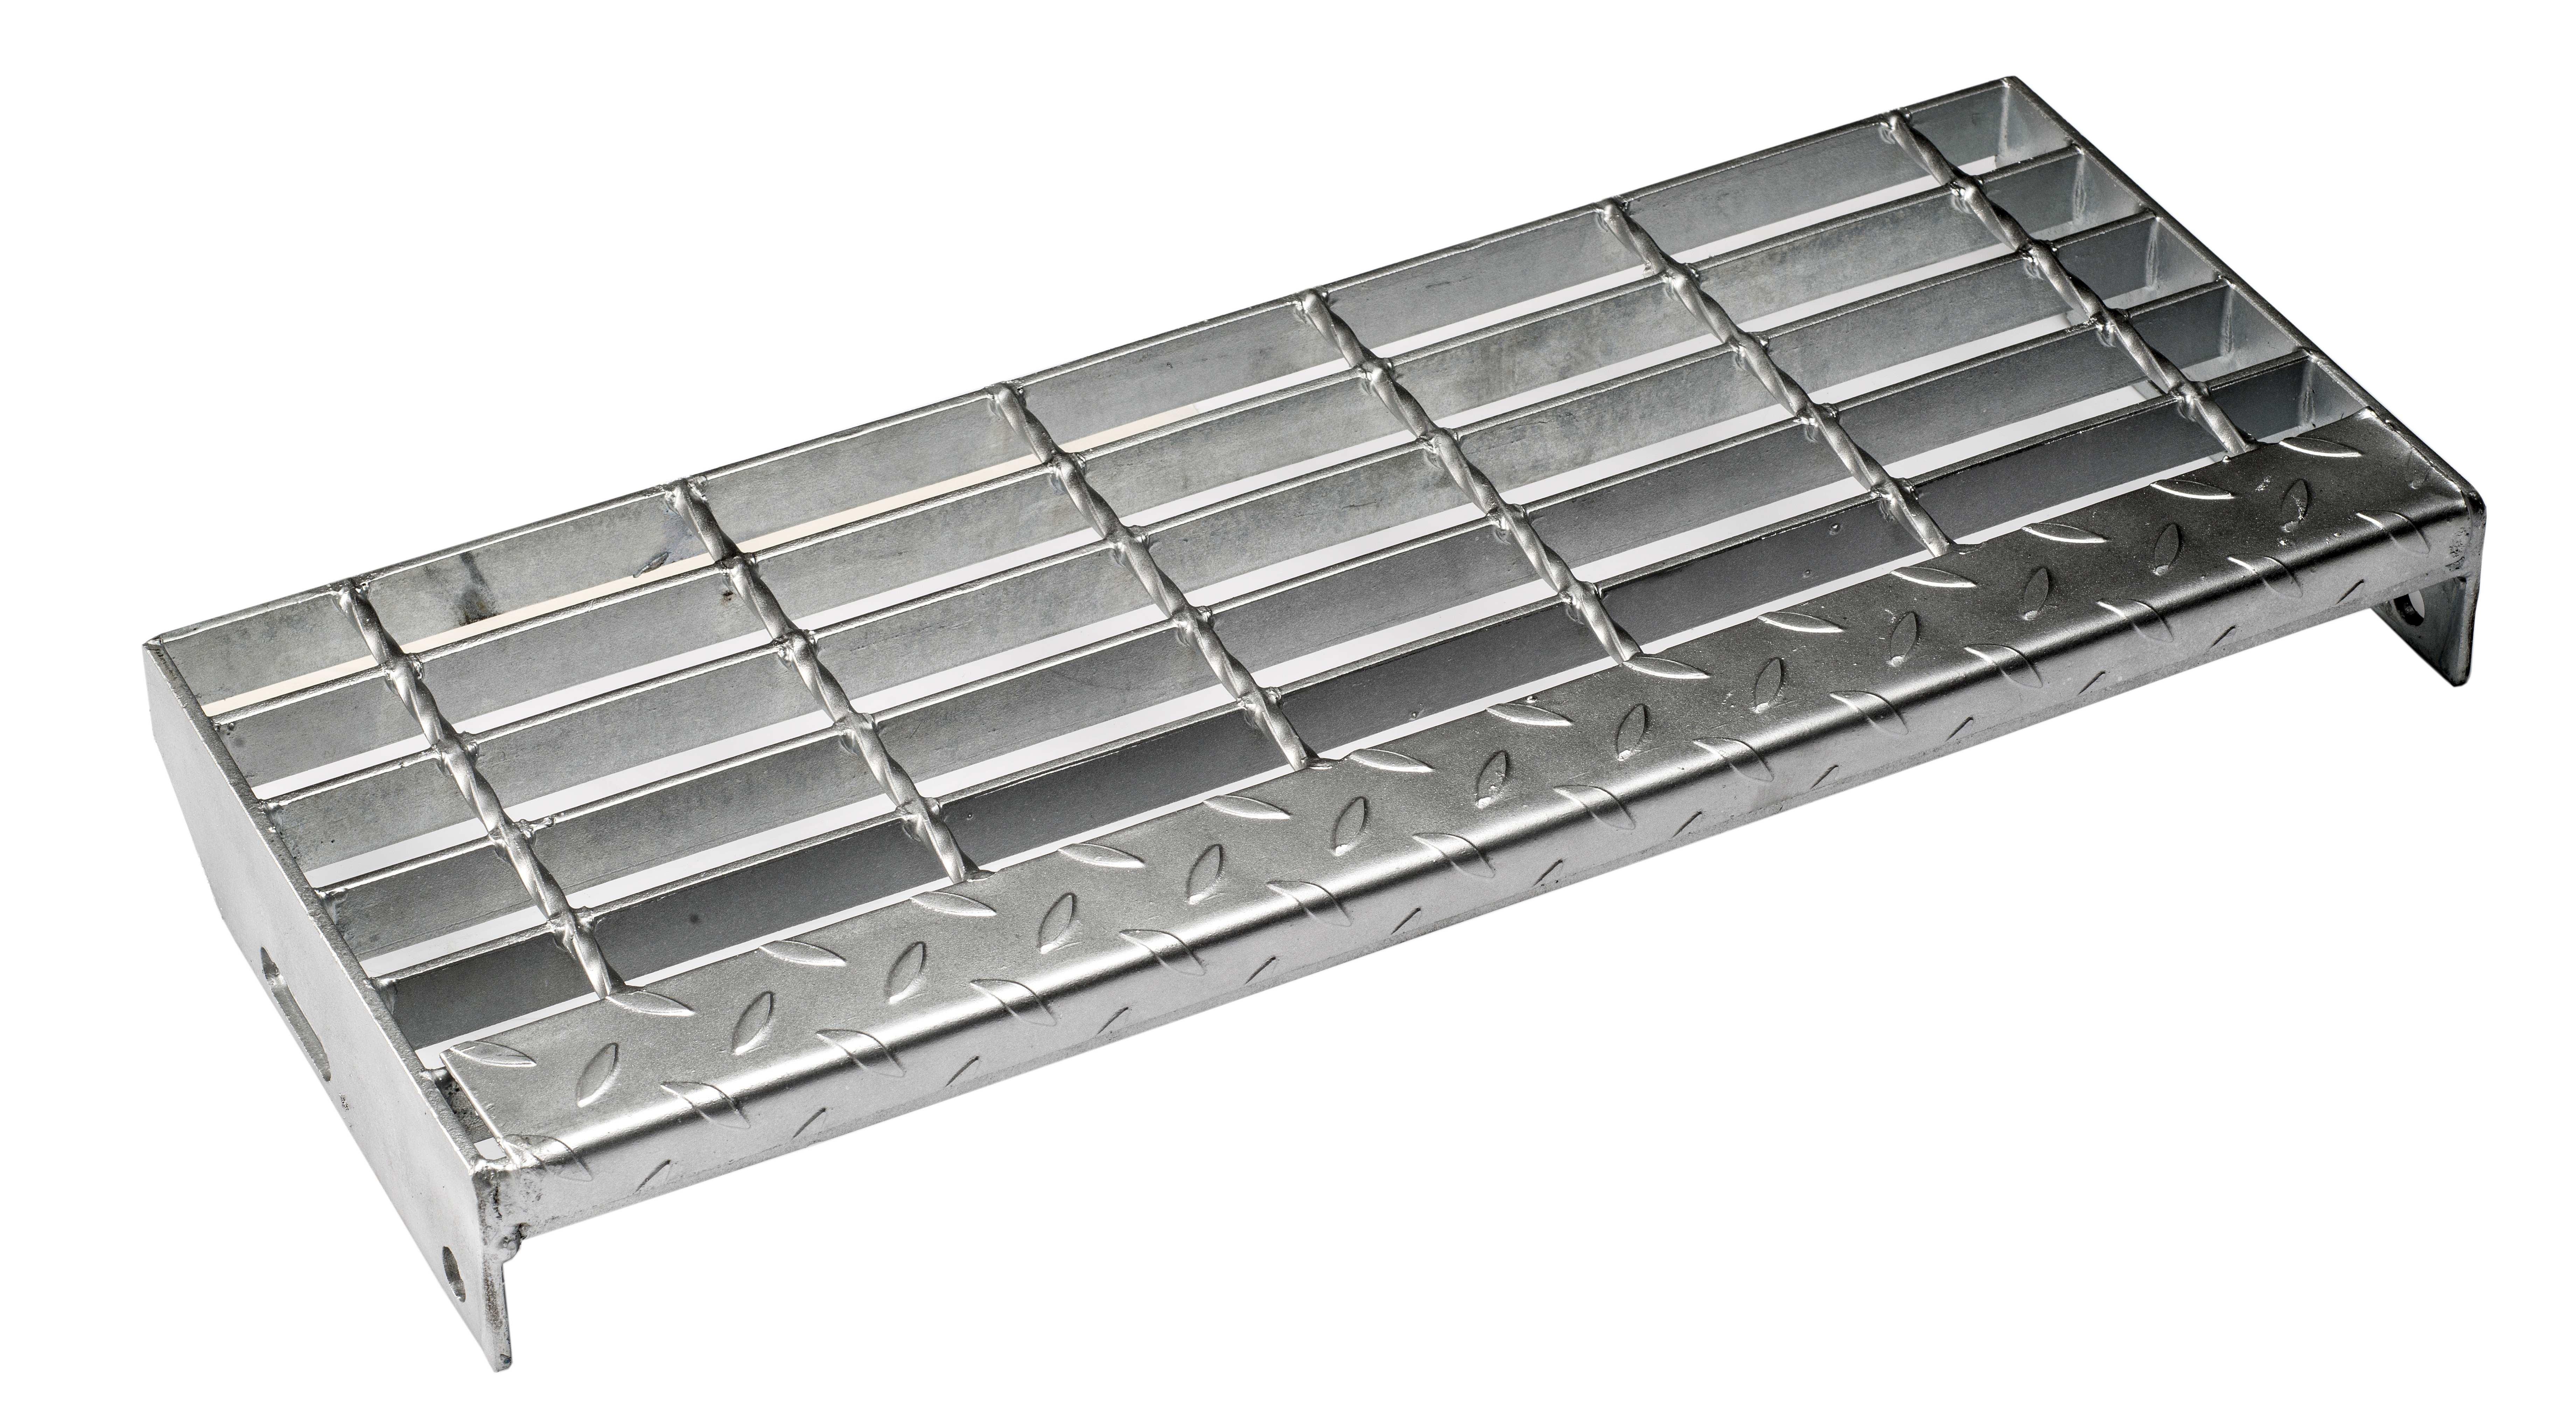 Steel T4 tread